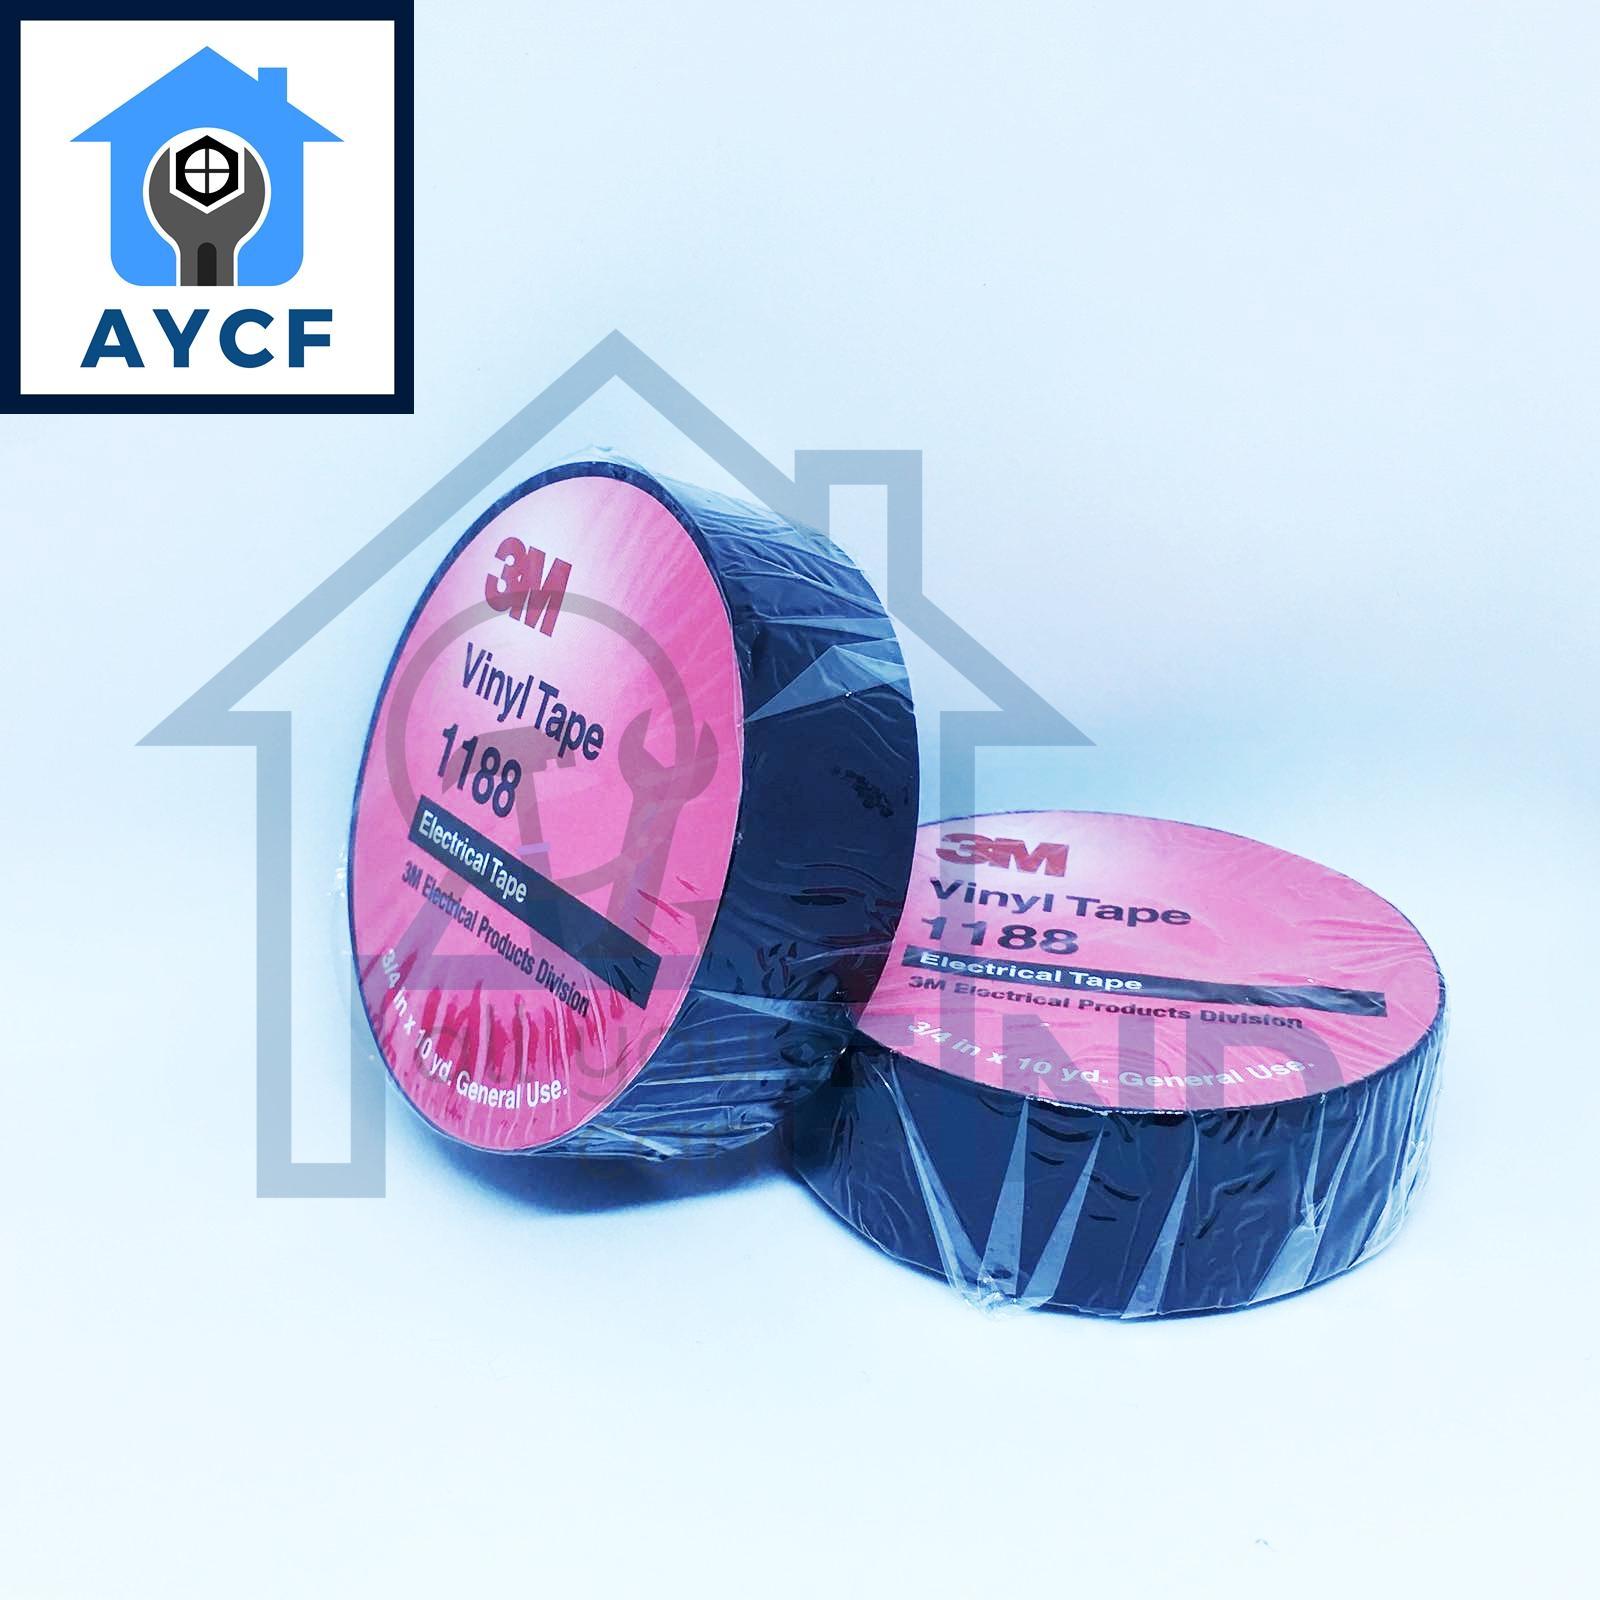 3M Insulation / Electrical Tape ( 3/4 Inch x 10 Yard ) - Black